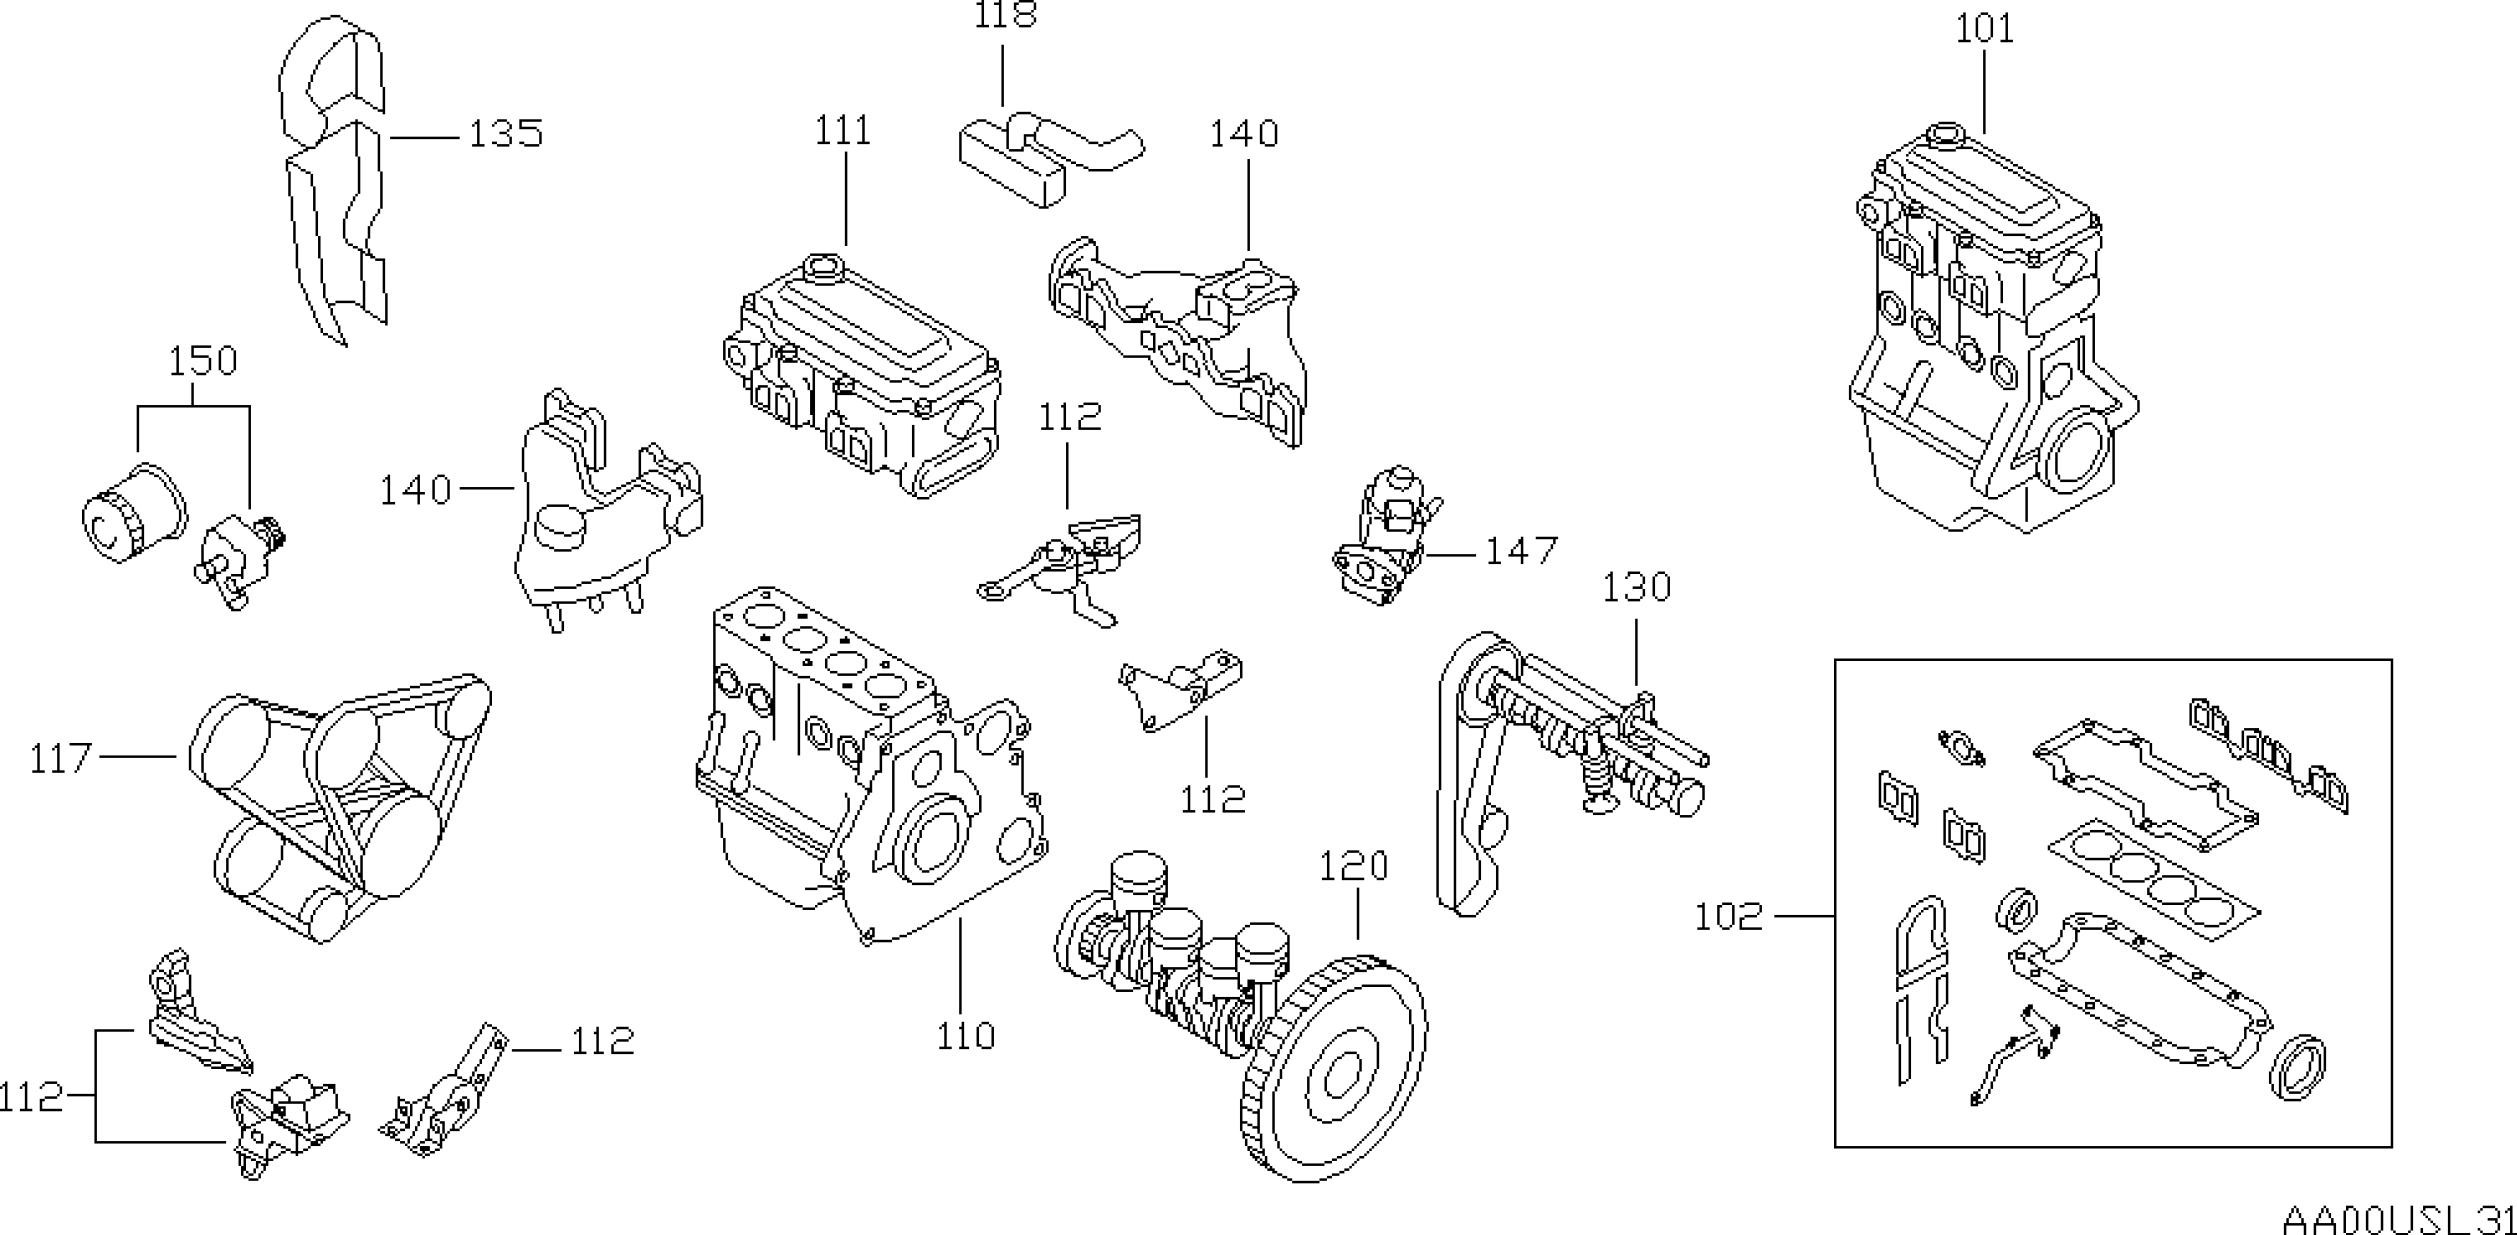 2005 Nissan Altima 2 5 Engine Diagram 2005 Nissan Altima Motor Diagrams Wiring Diagram Services •